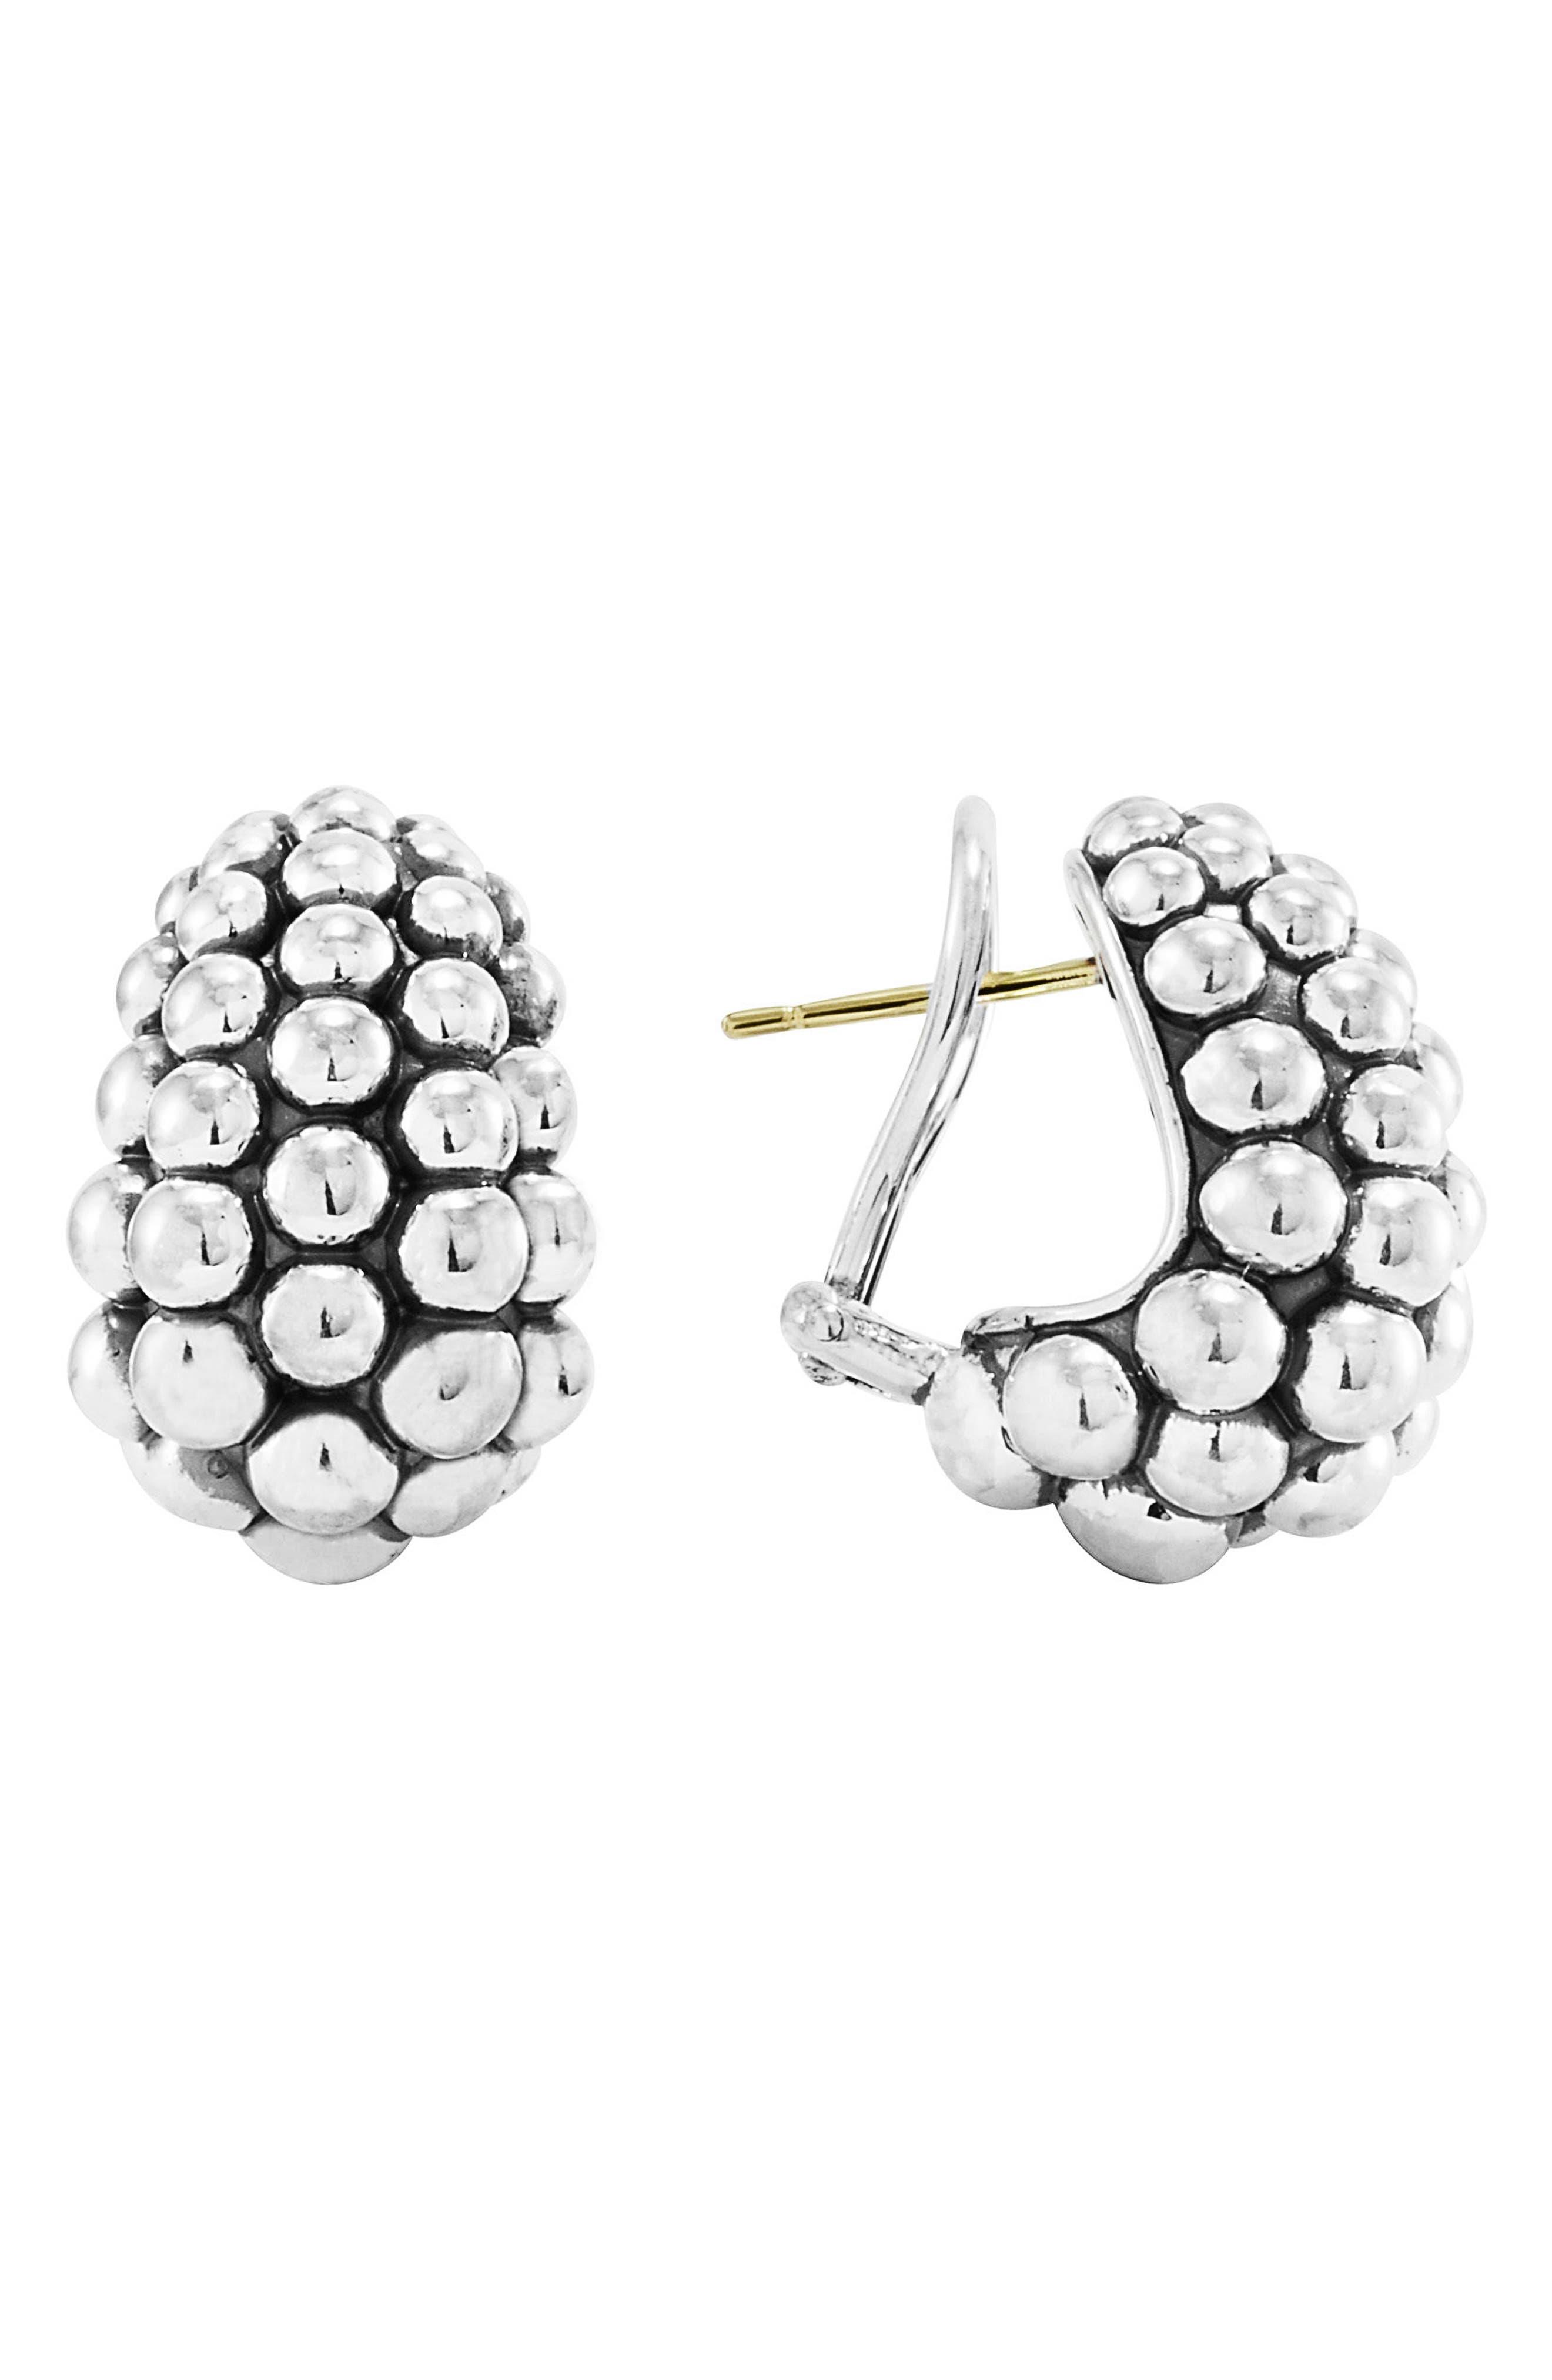 Alternate Image 1 Selected - LAGOS 'Bold' Caviar Hoop Earrings